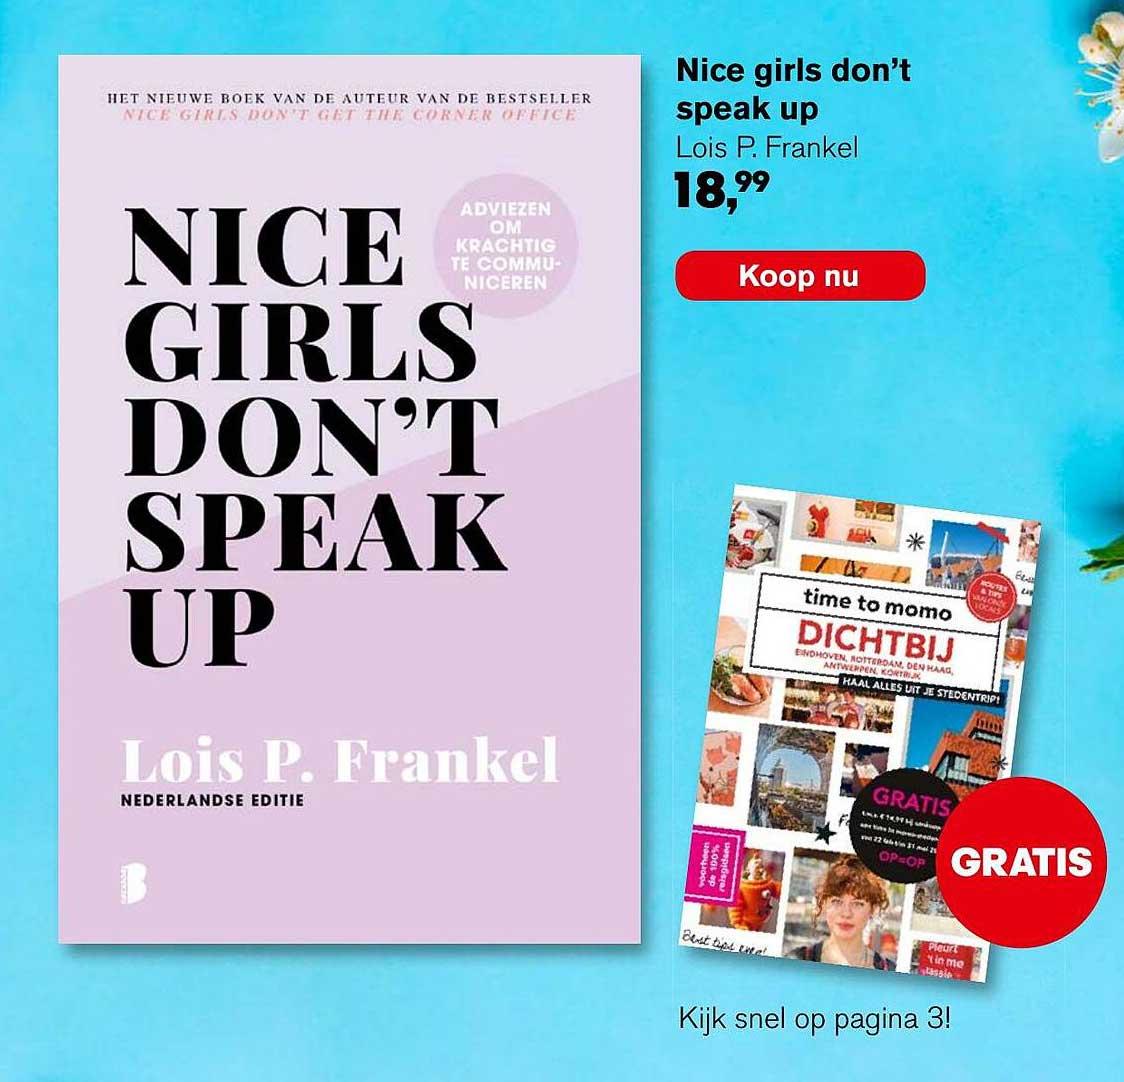 AKO Nice Girls Don't Speak Up - Lois P. Frankel